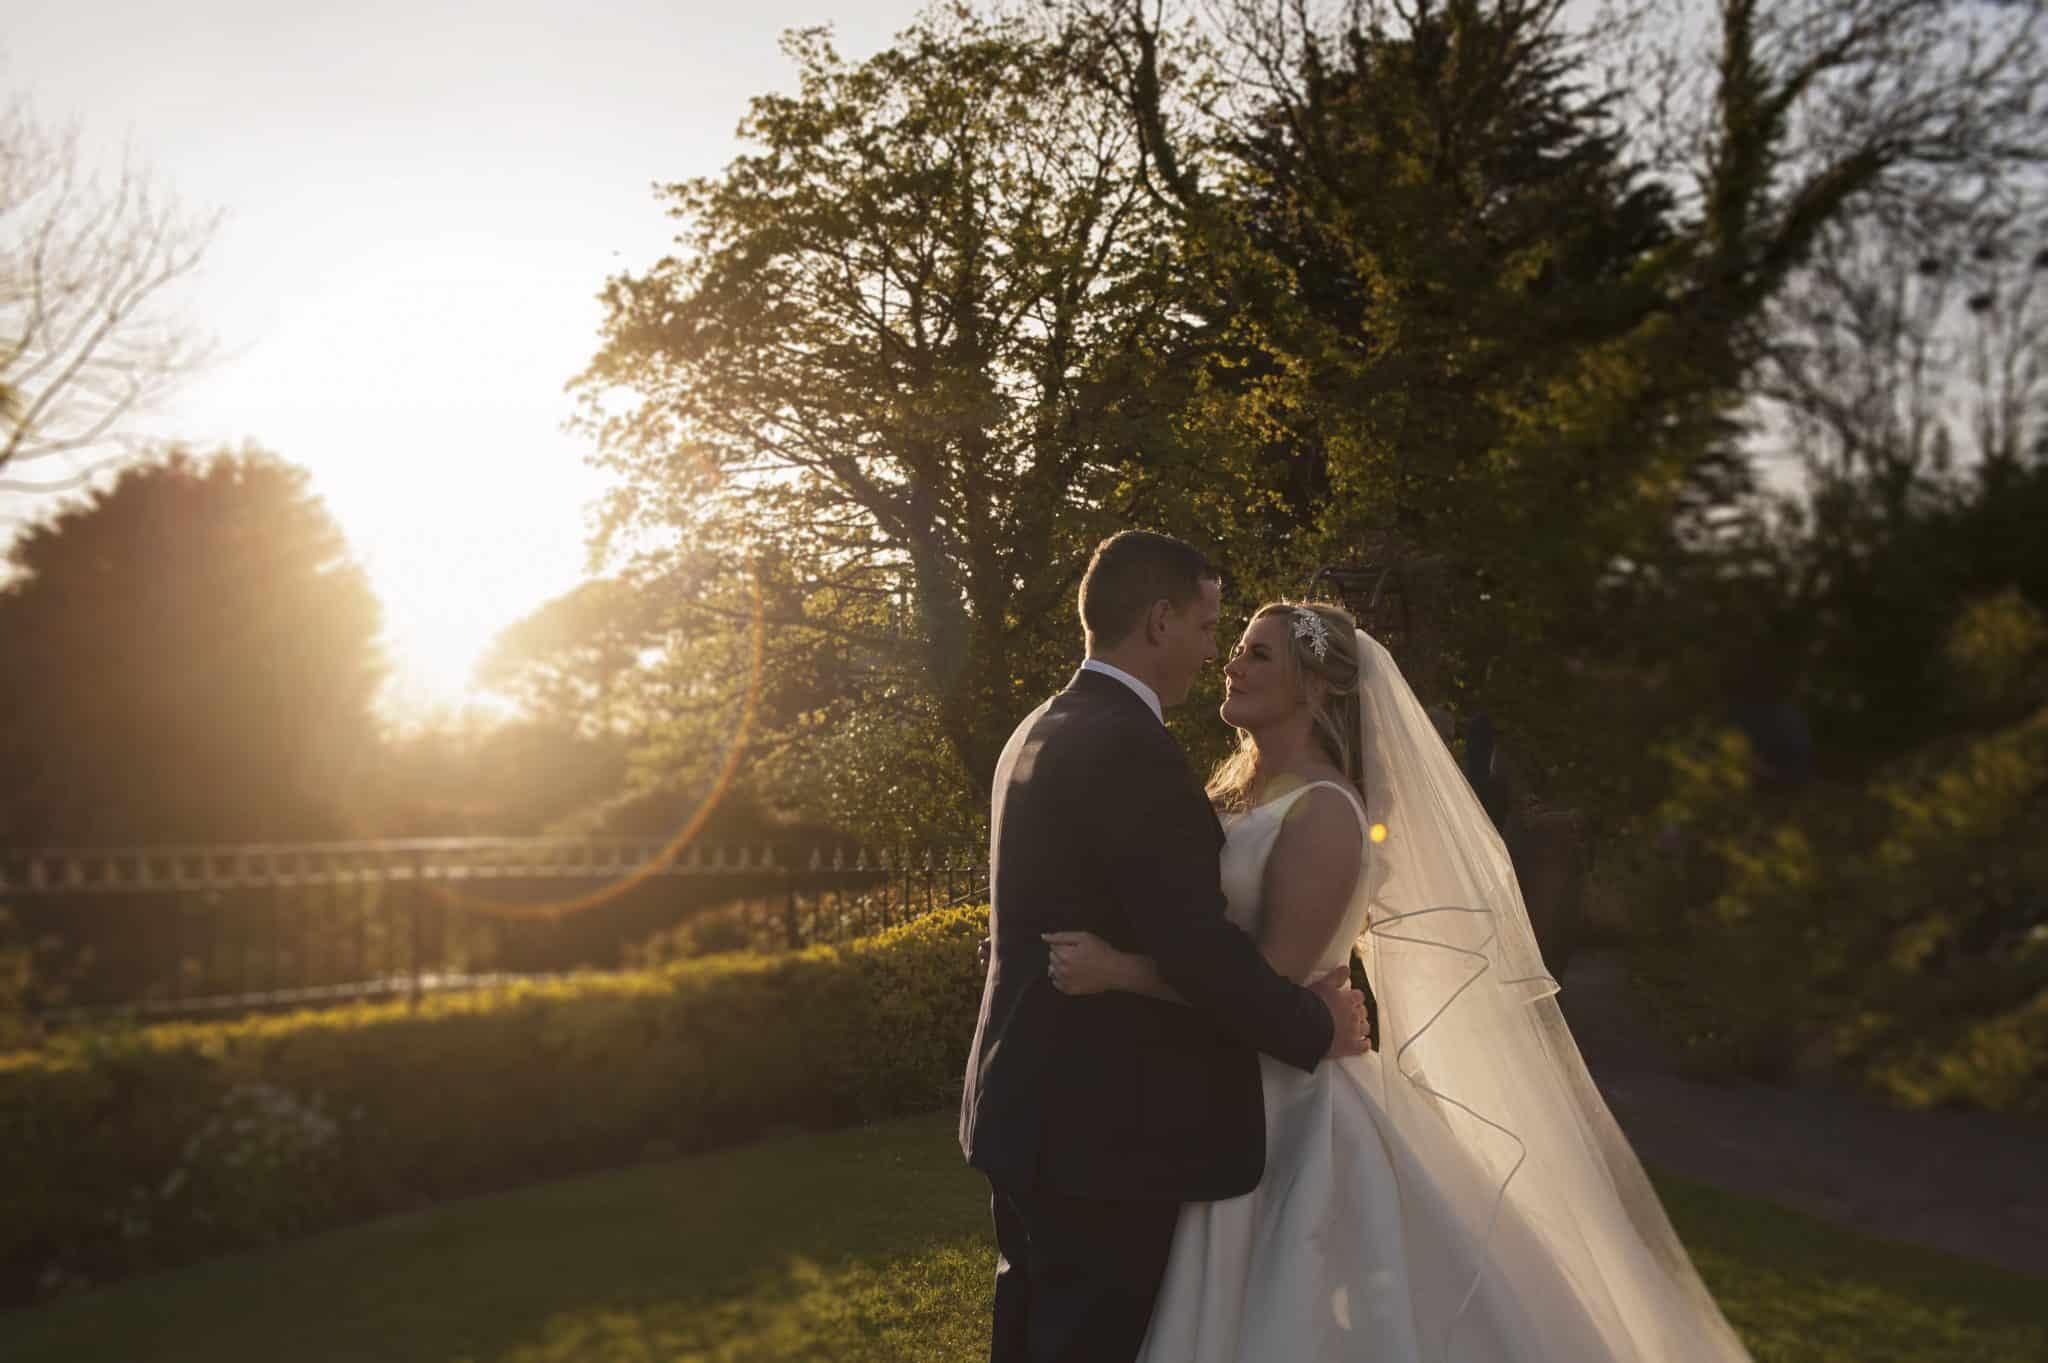 Bride & Groom stood in garden at sunset